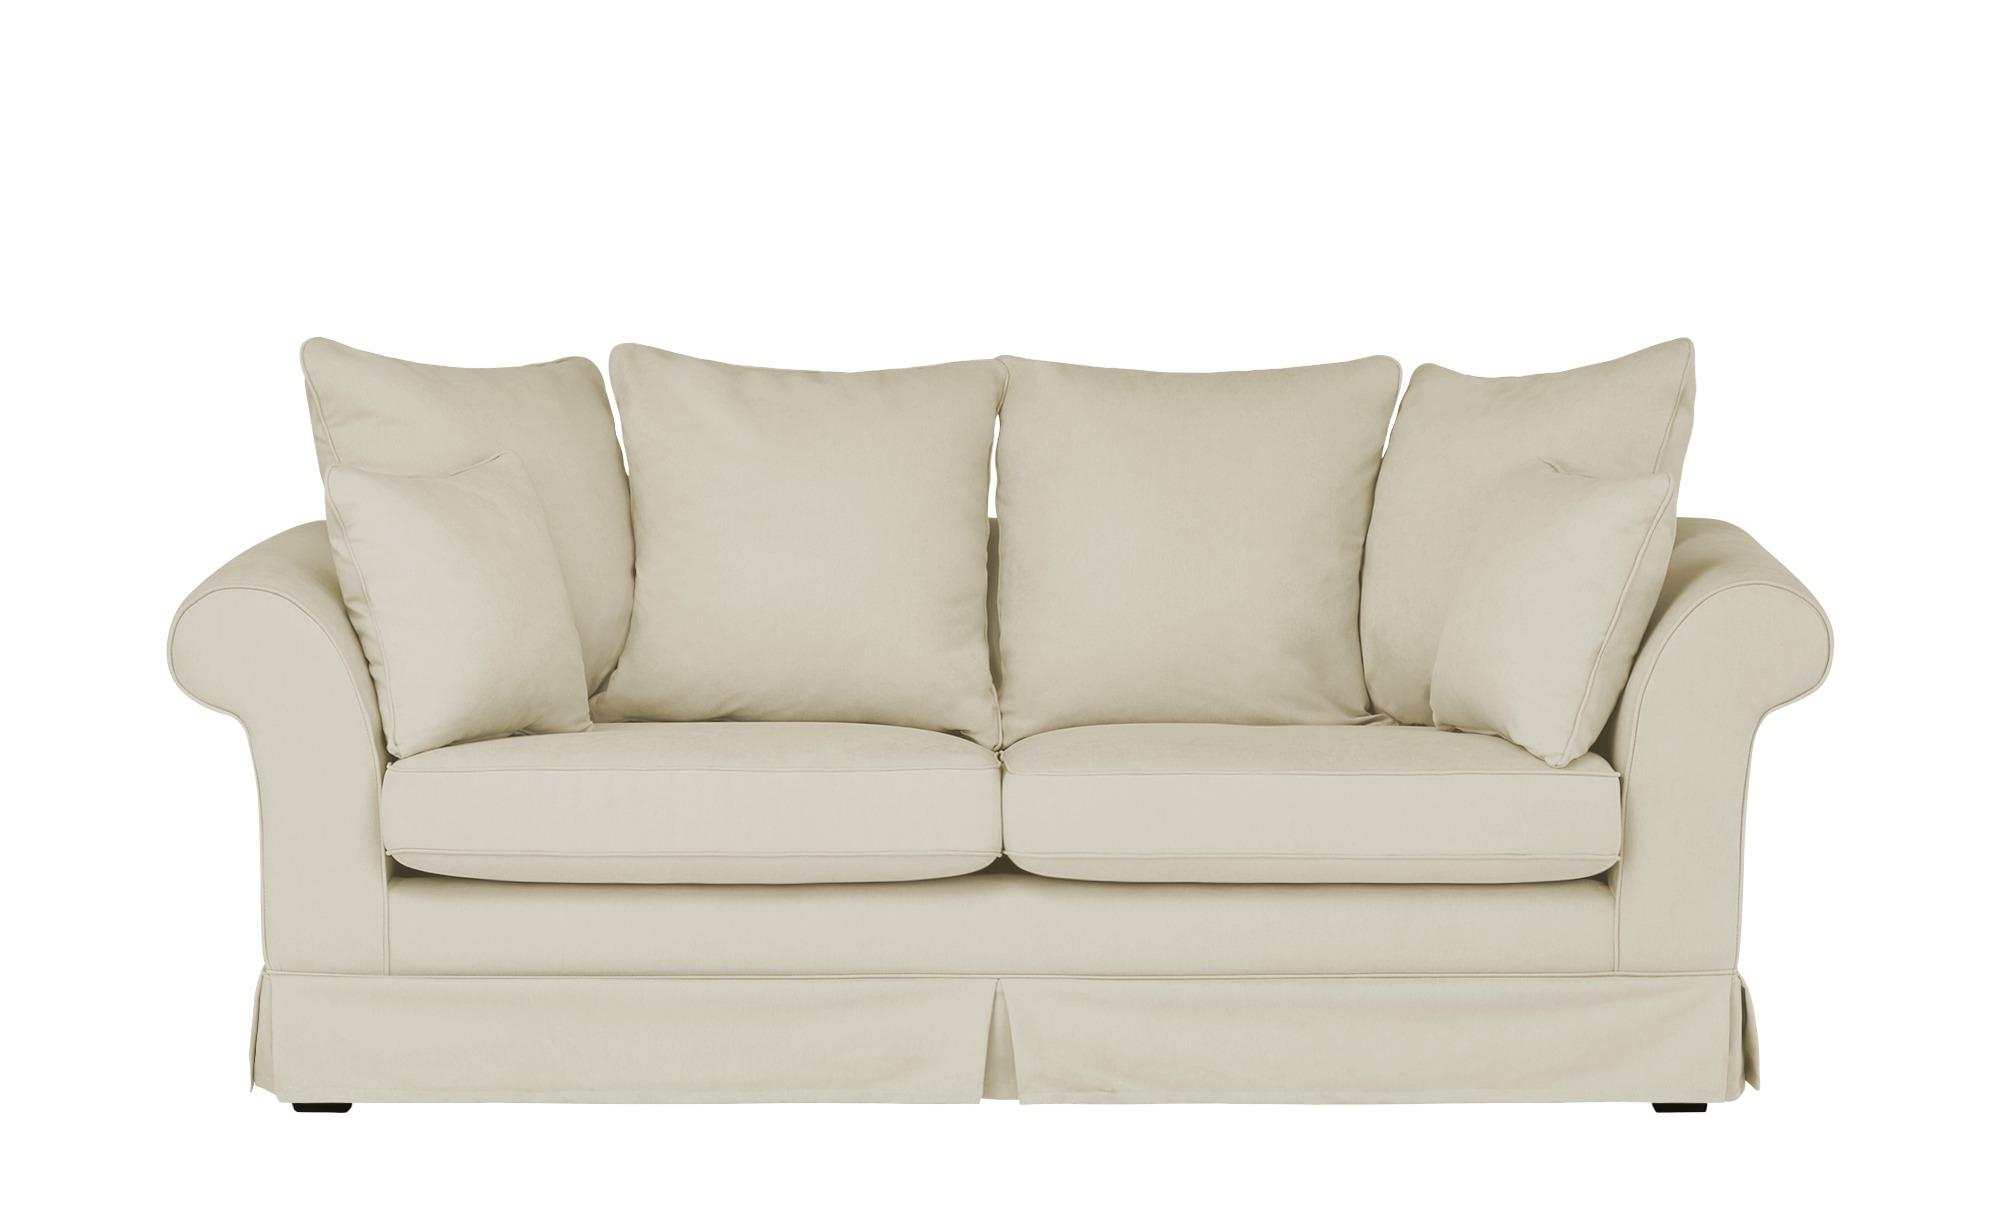 Hussensofa, 3-sitzig  Hampton ¦ creme ¦ Maße (cm): B: 214 H: 70 T: 92 Polstermöbel > Sofas > 3-Sitzer - Höffner